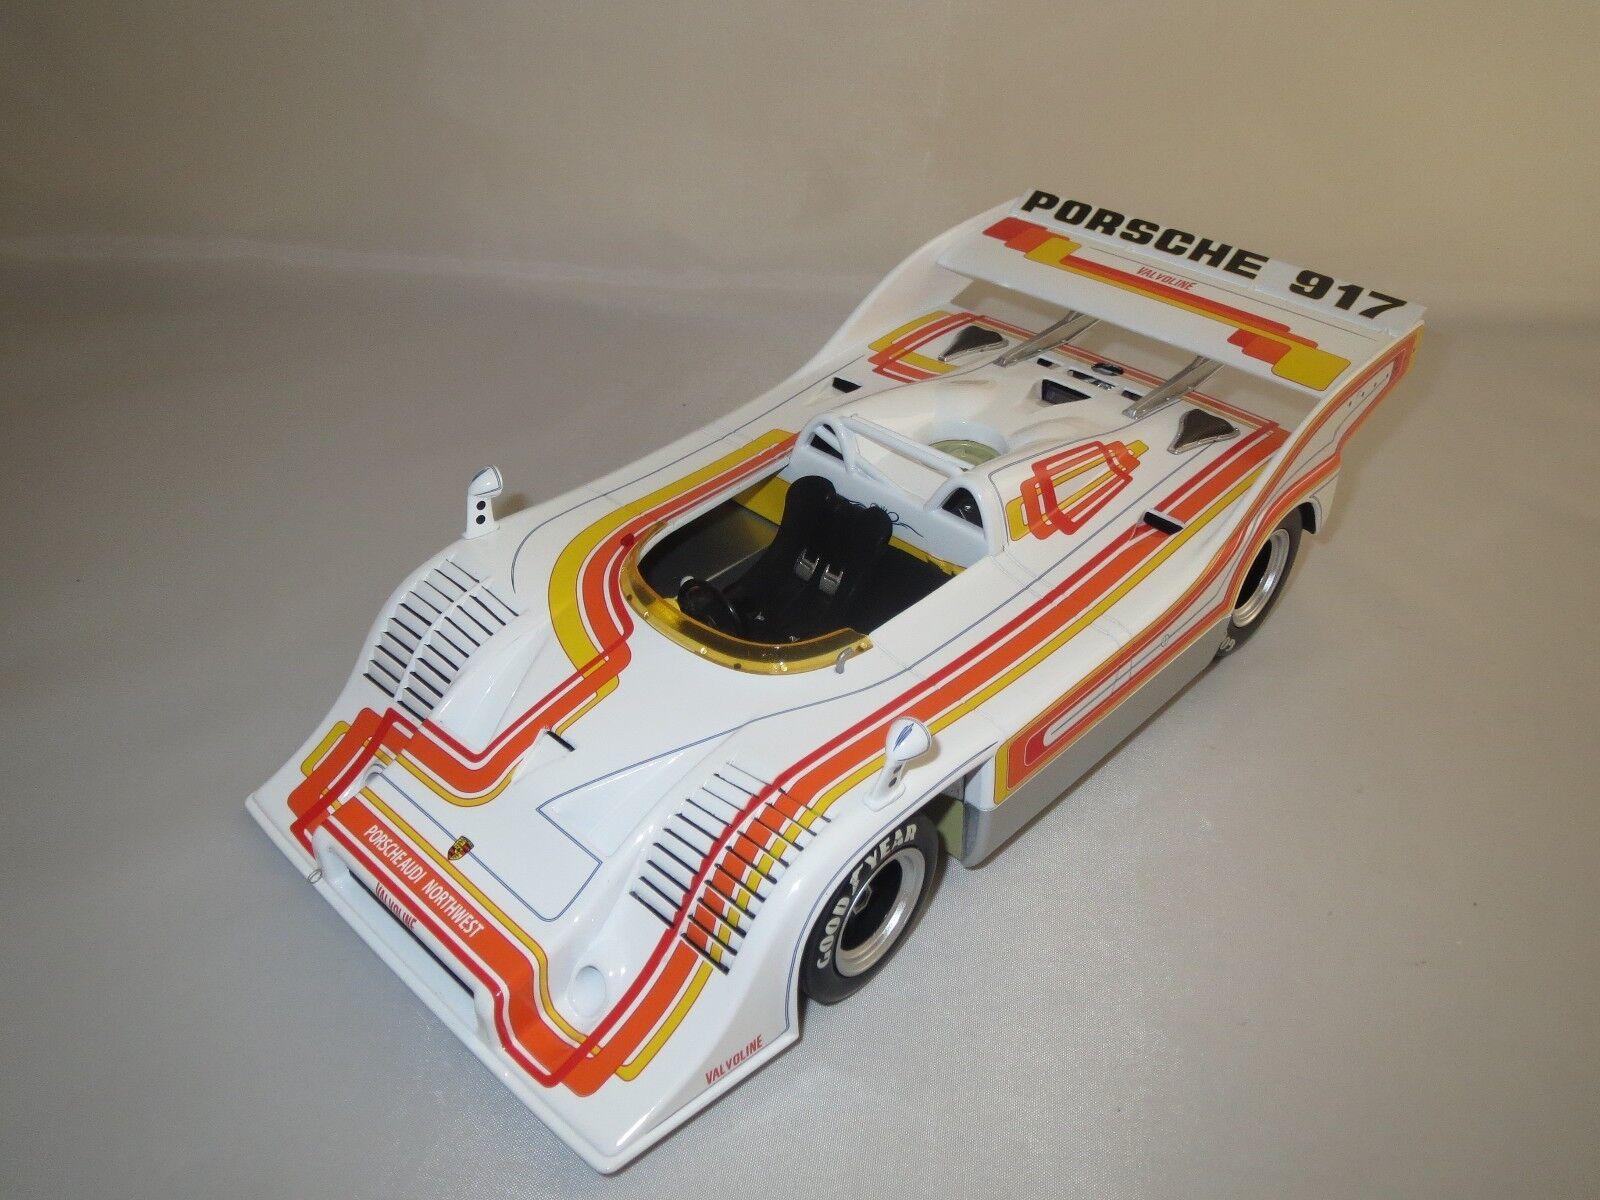 Minichamps Porsche 917 10 1 18 sans emballage